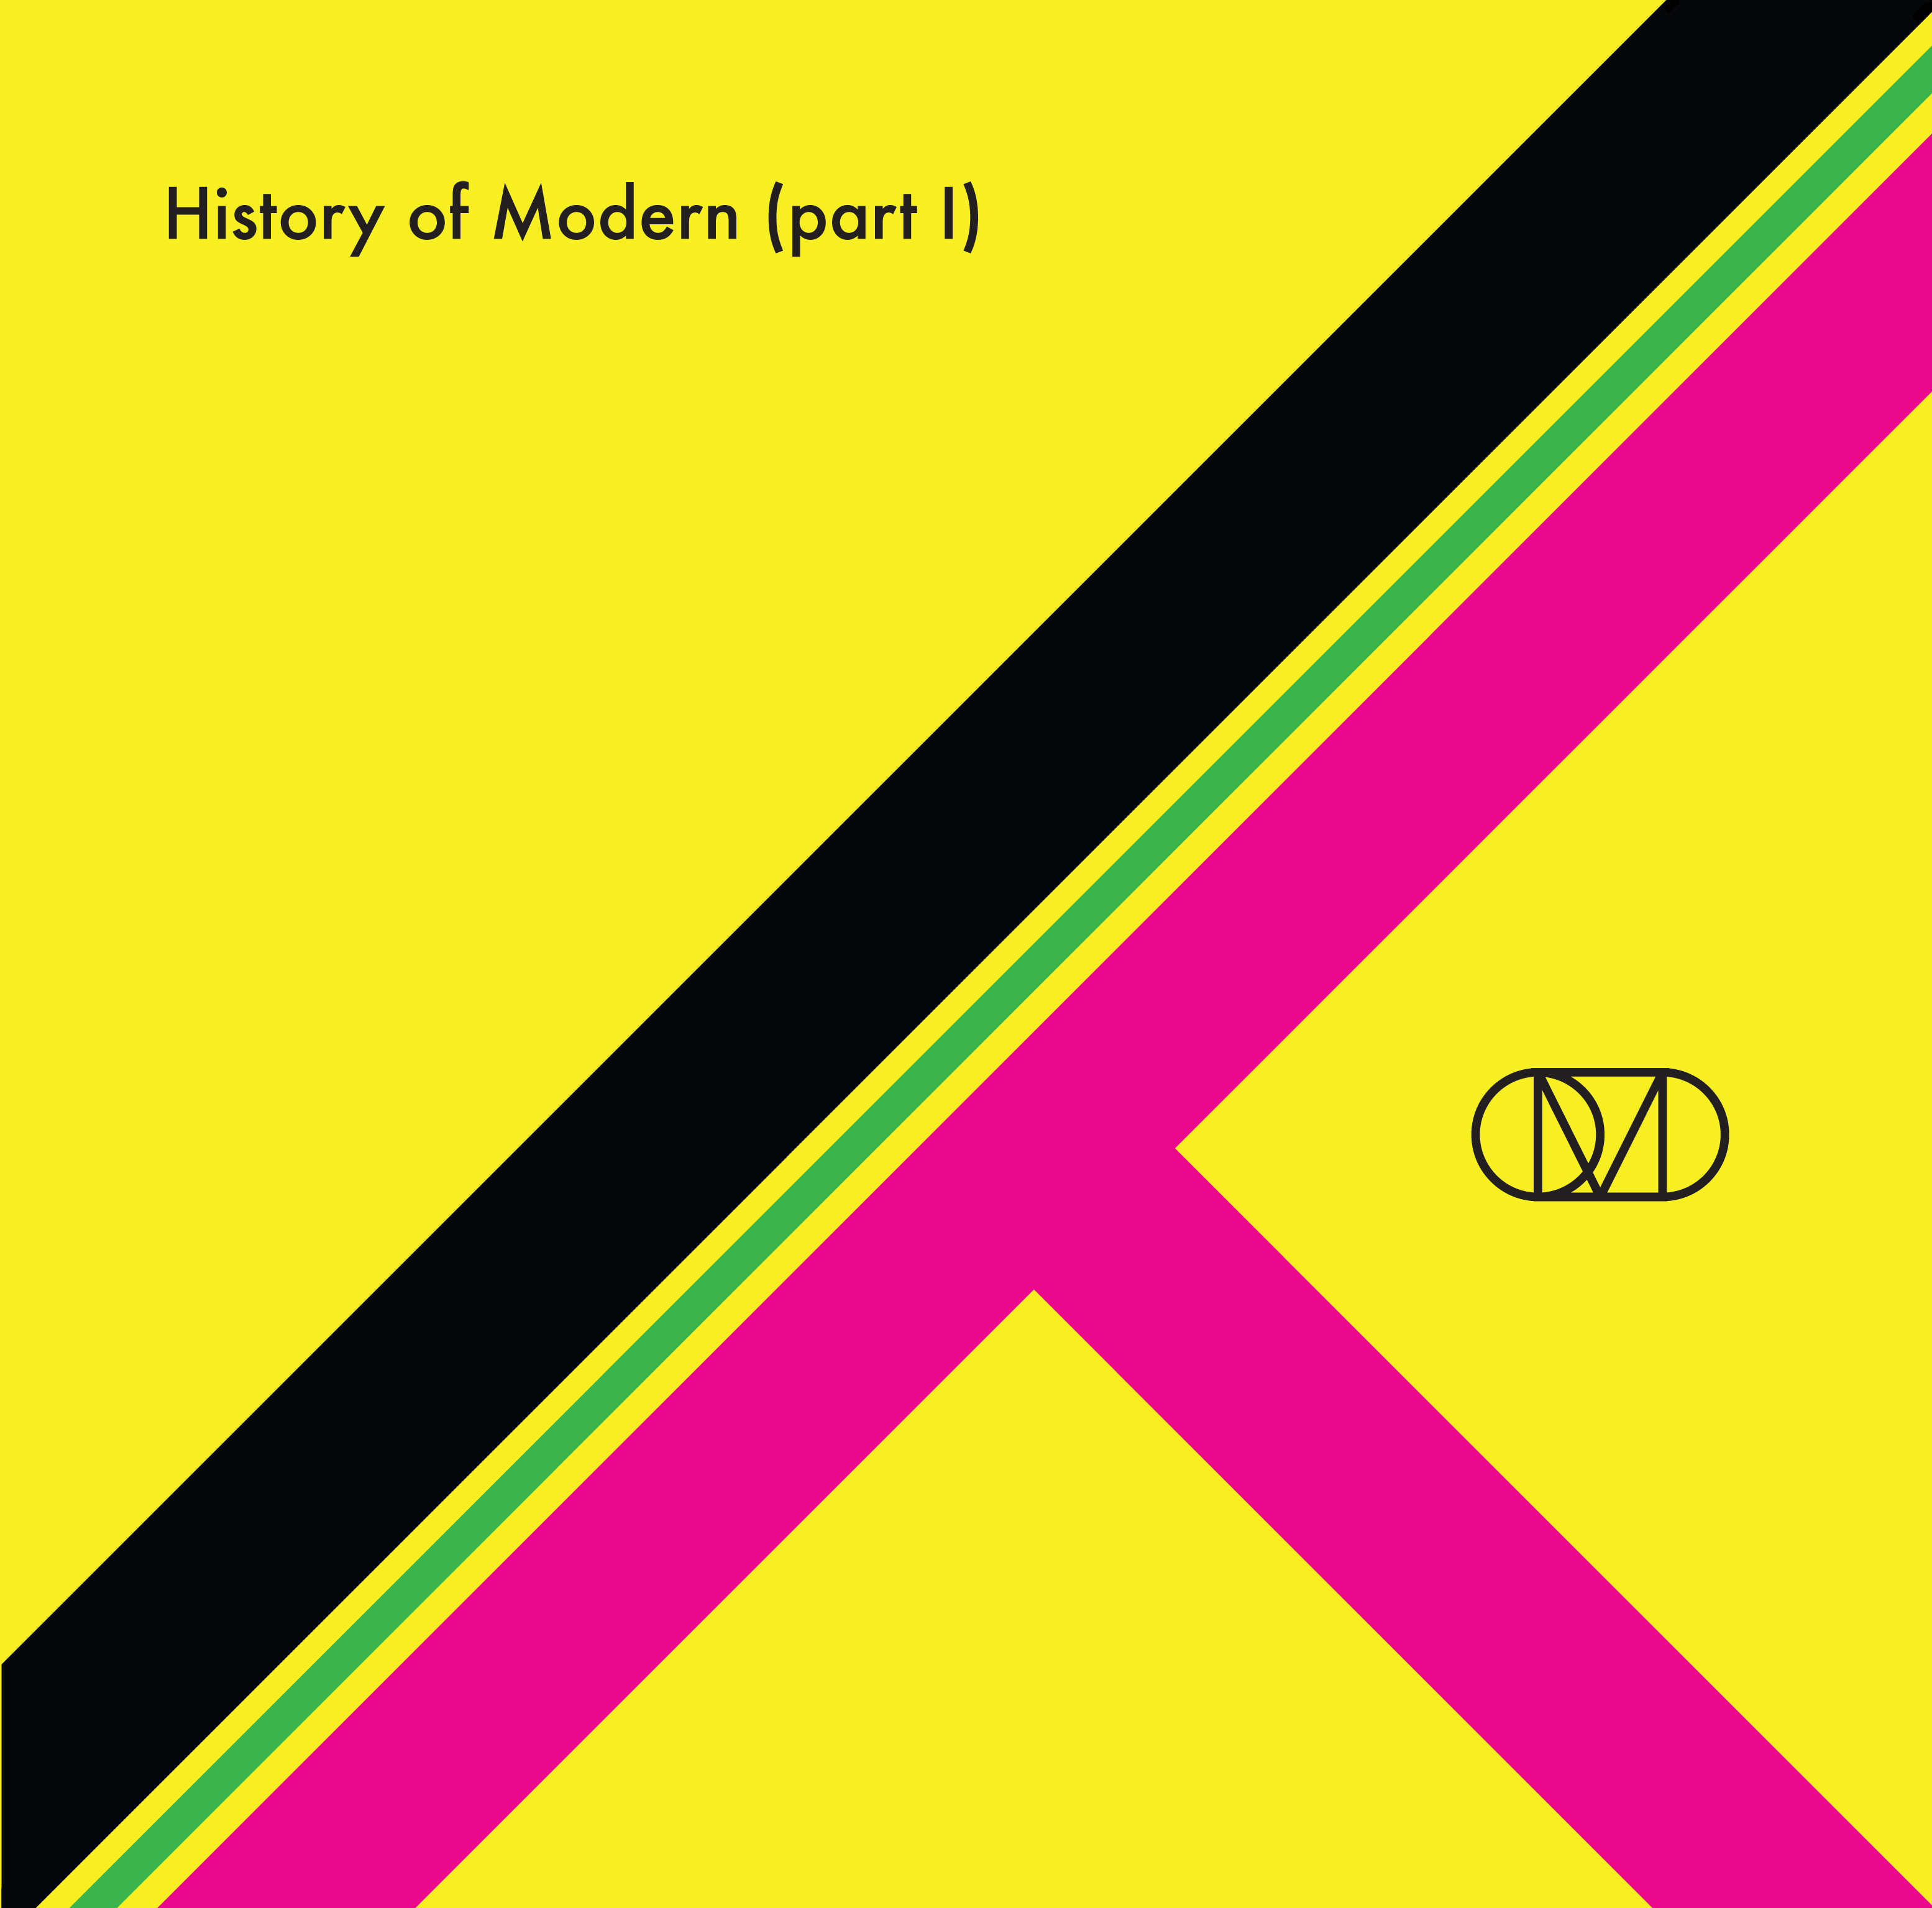 Video: OMD, 'History of Modern (Part I)'